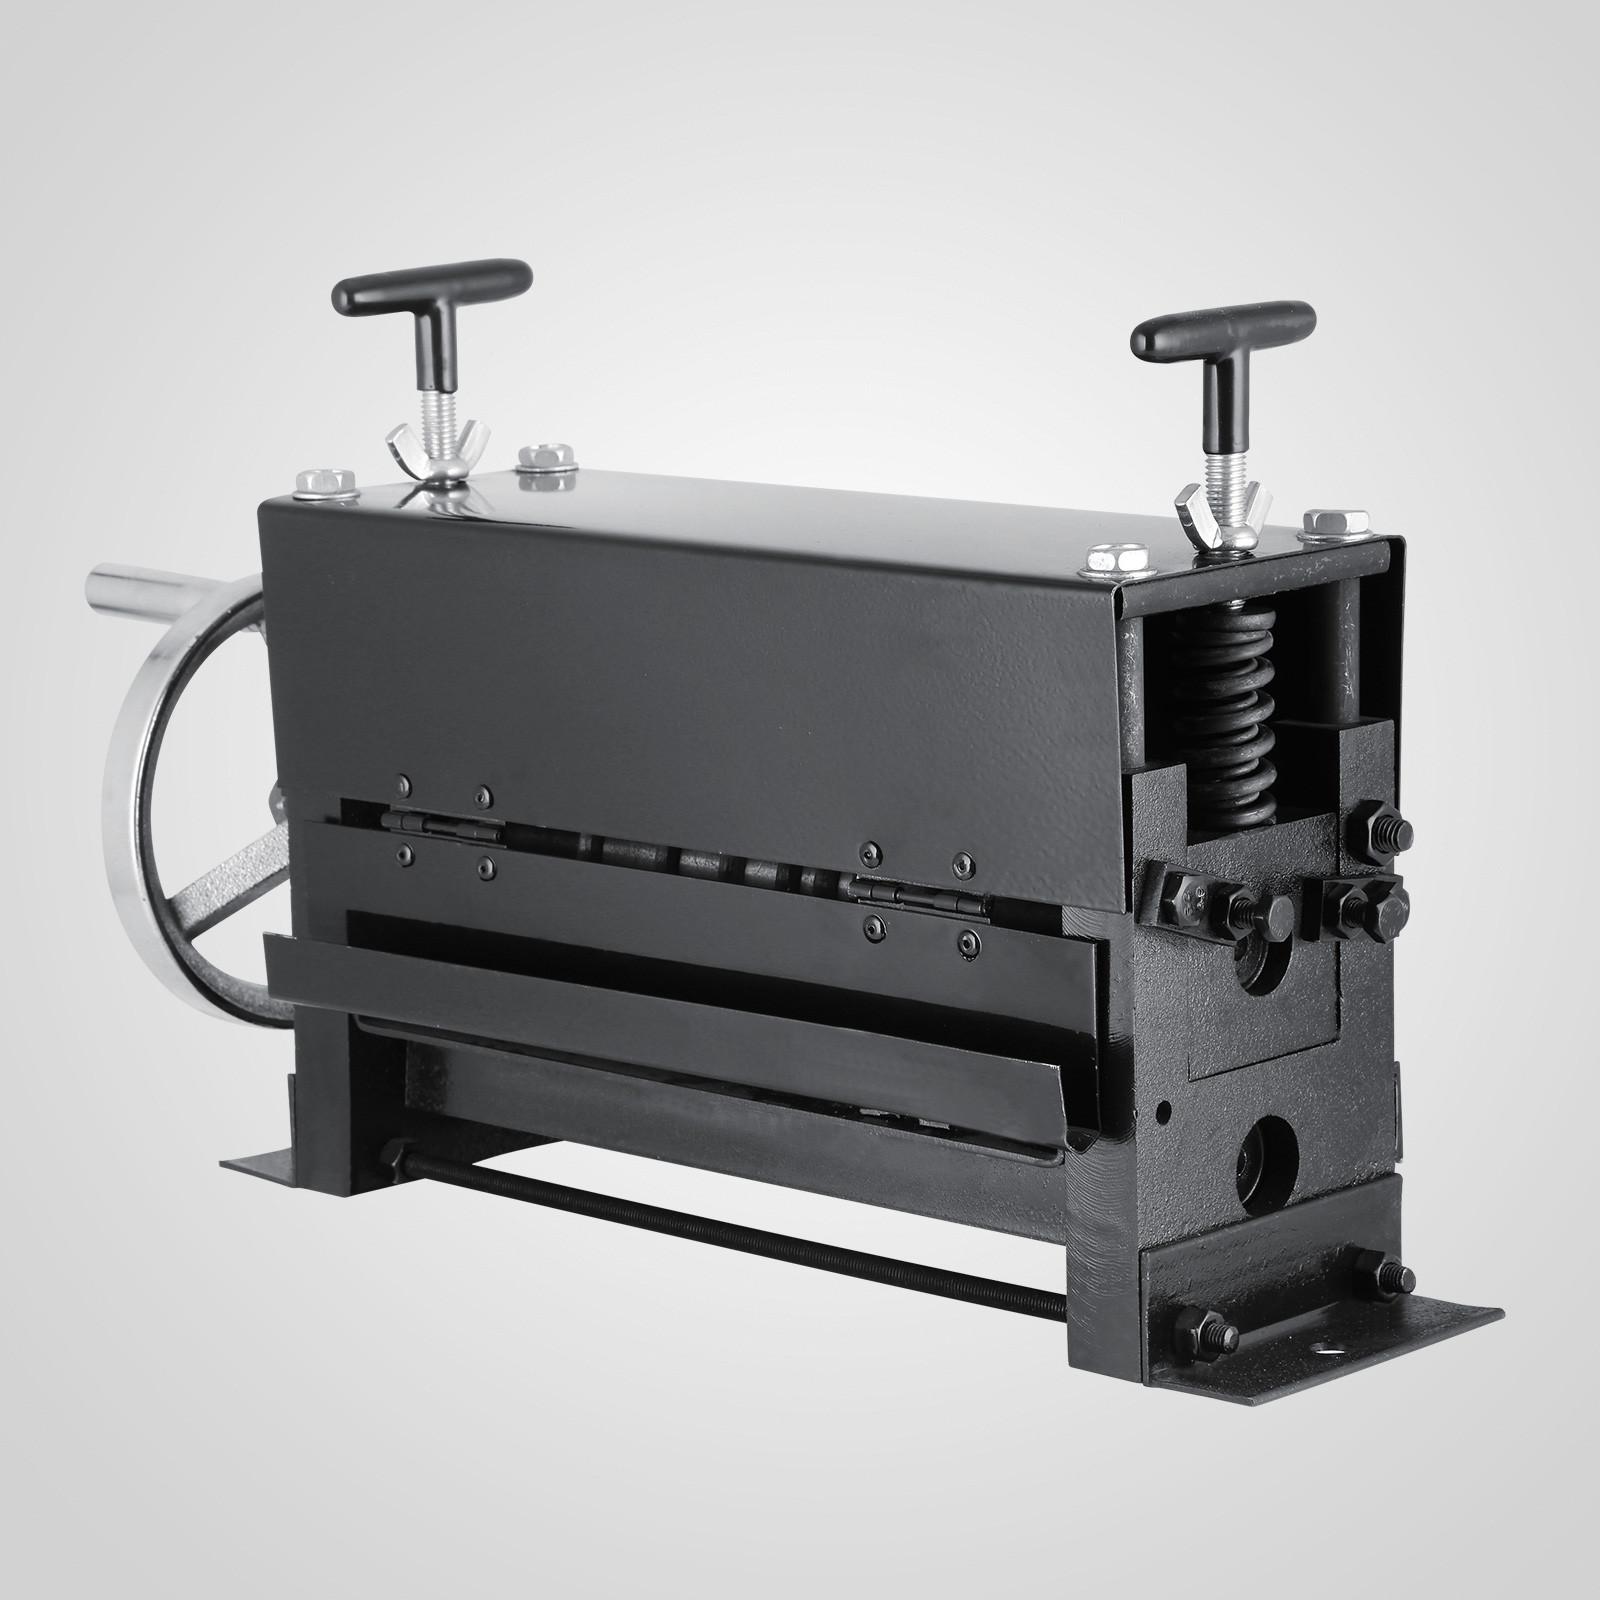 Machine Tool Cables : New copper wire stripping machine cable stripper scrap